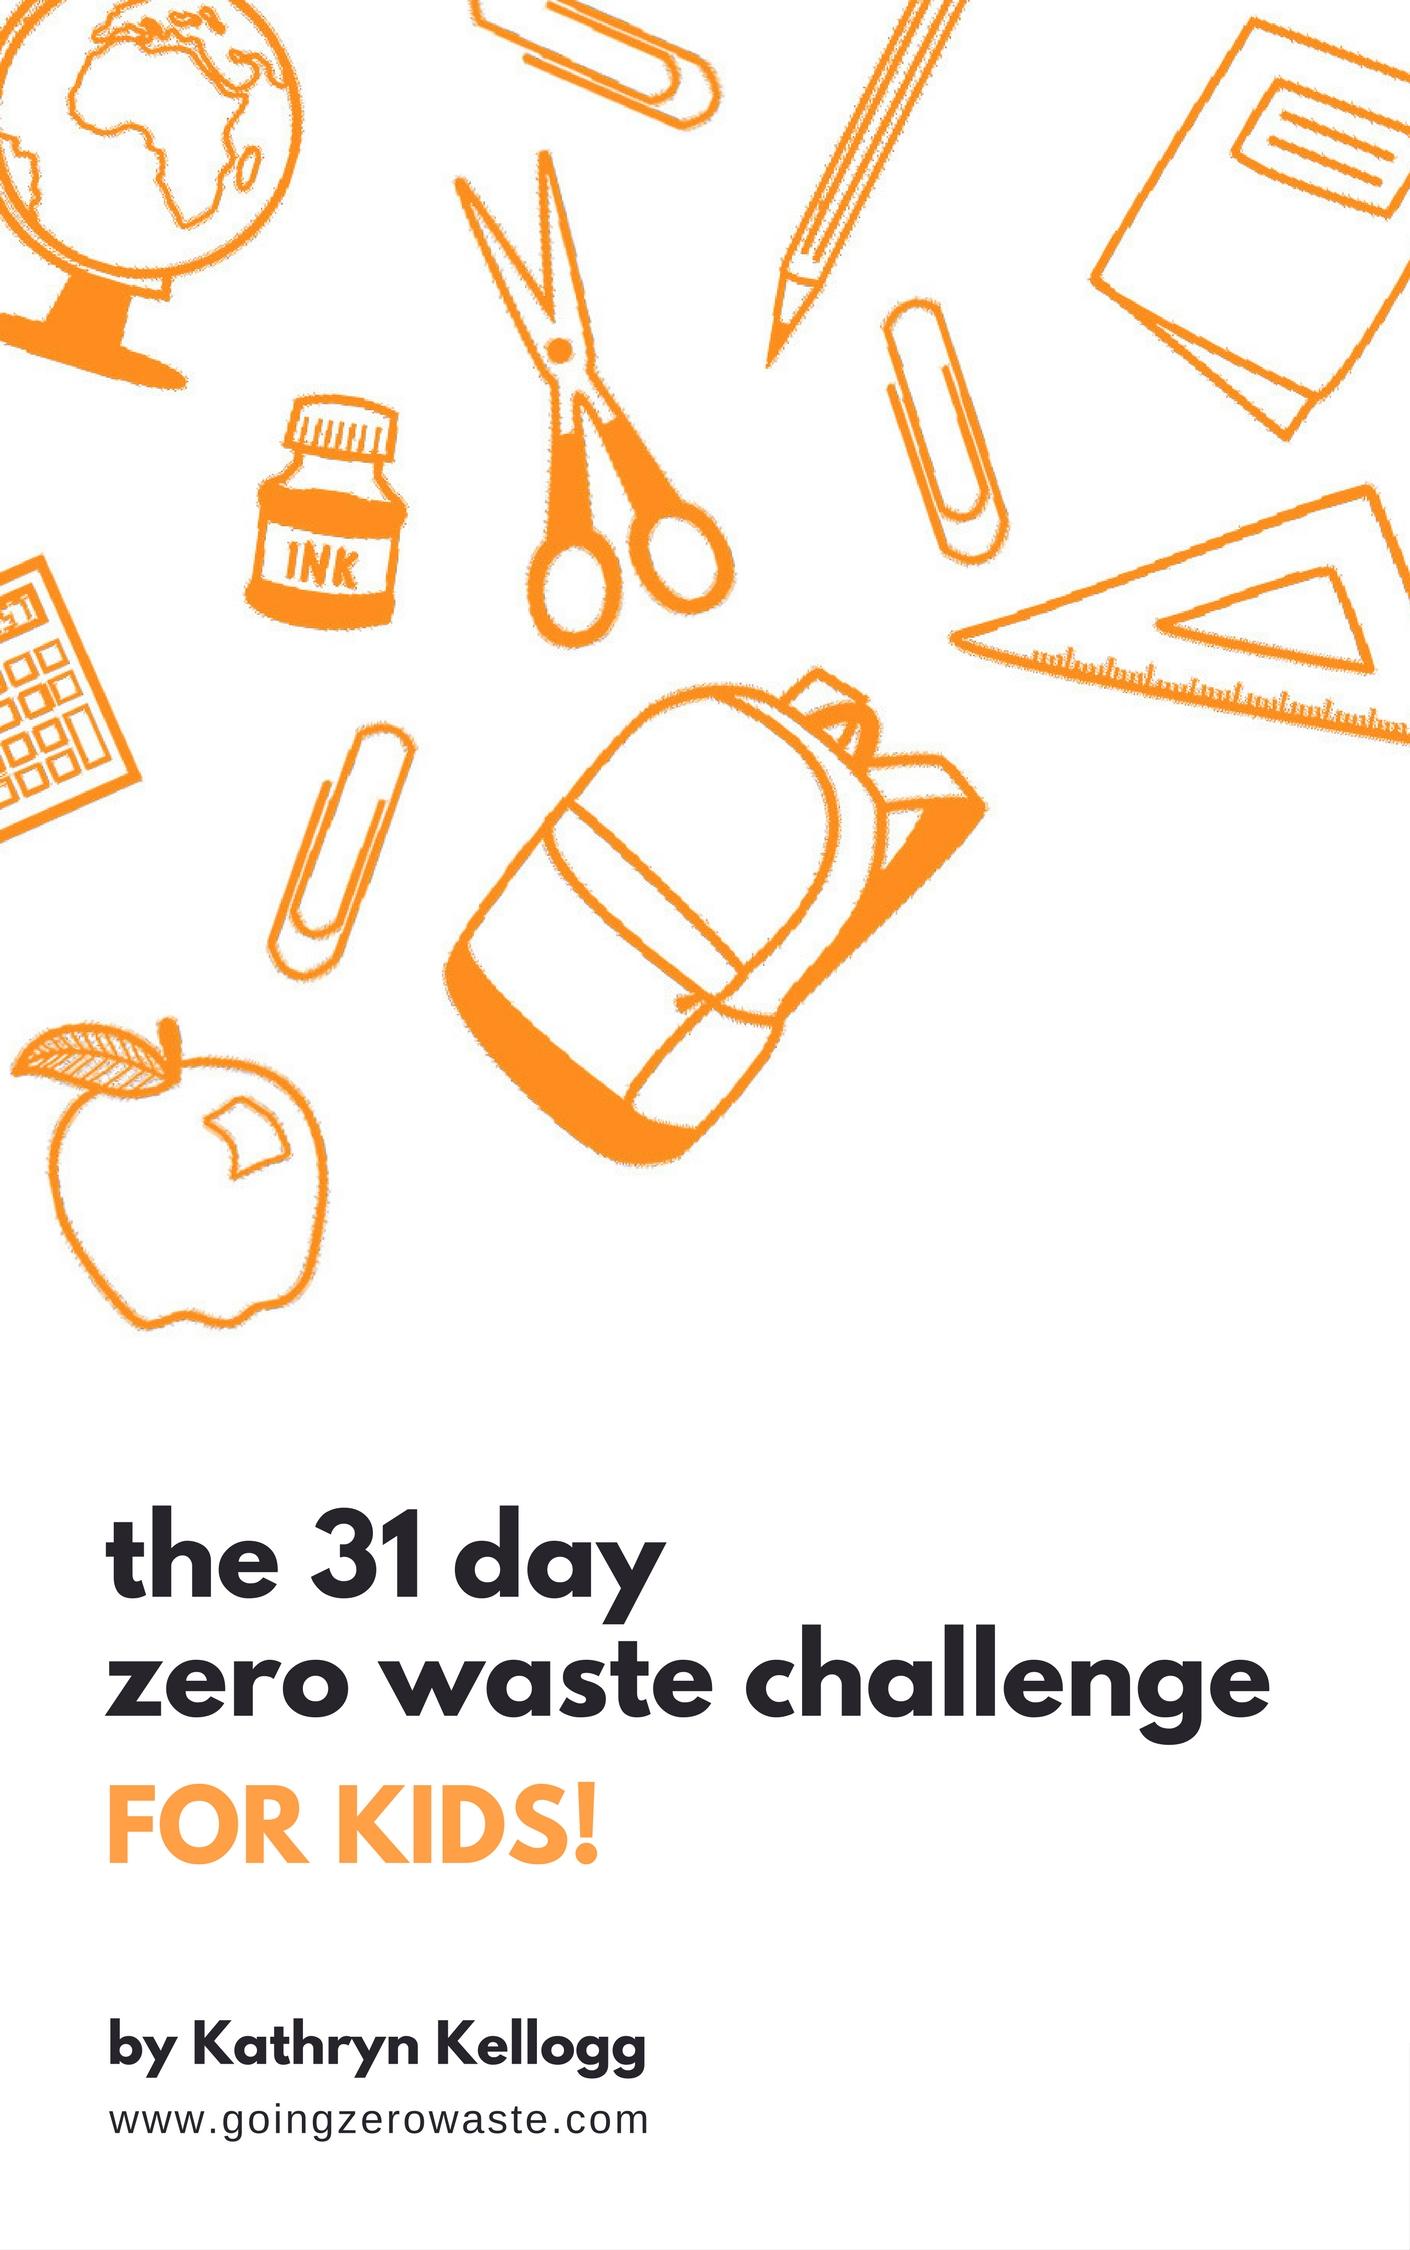 The 31 Day Zero Waste Challenge for Kids! from www.goingzerowaste.com